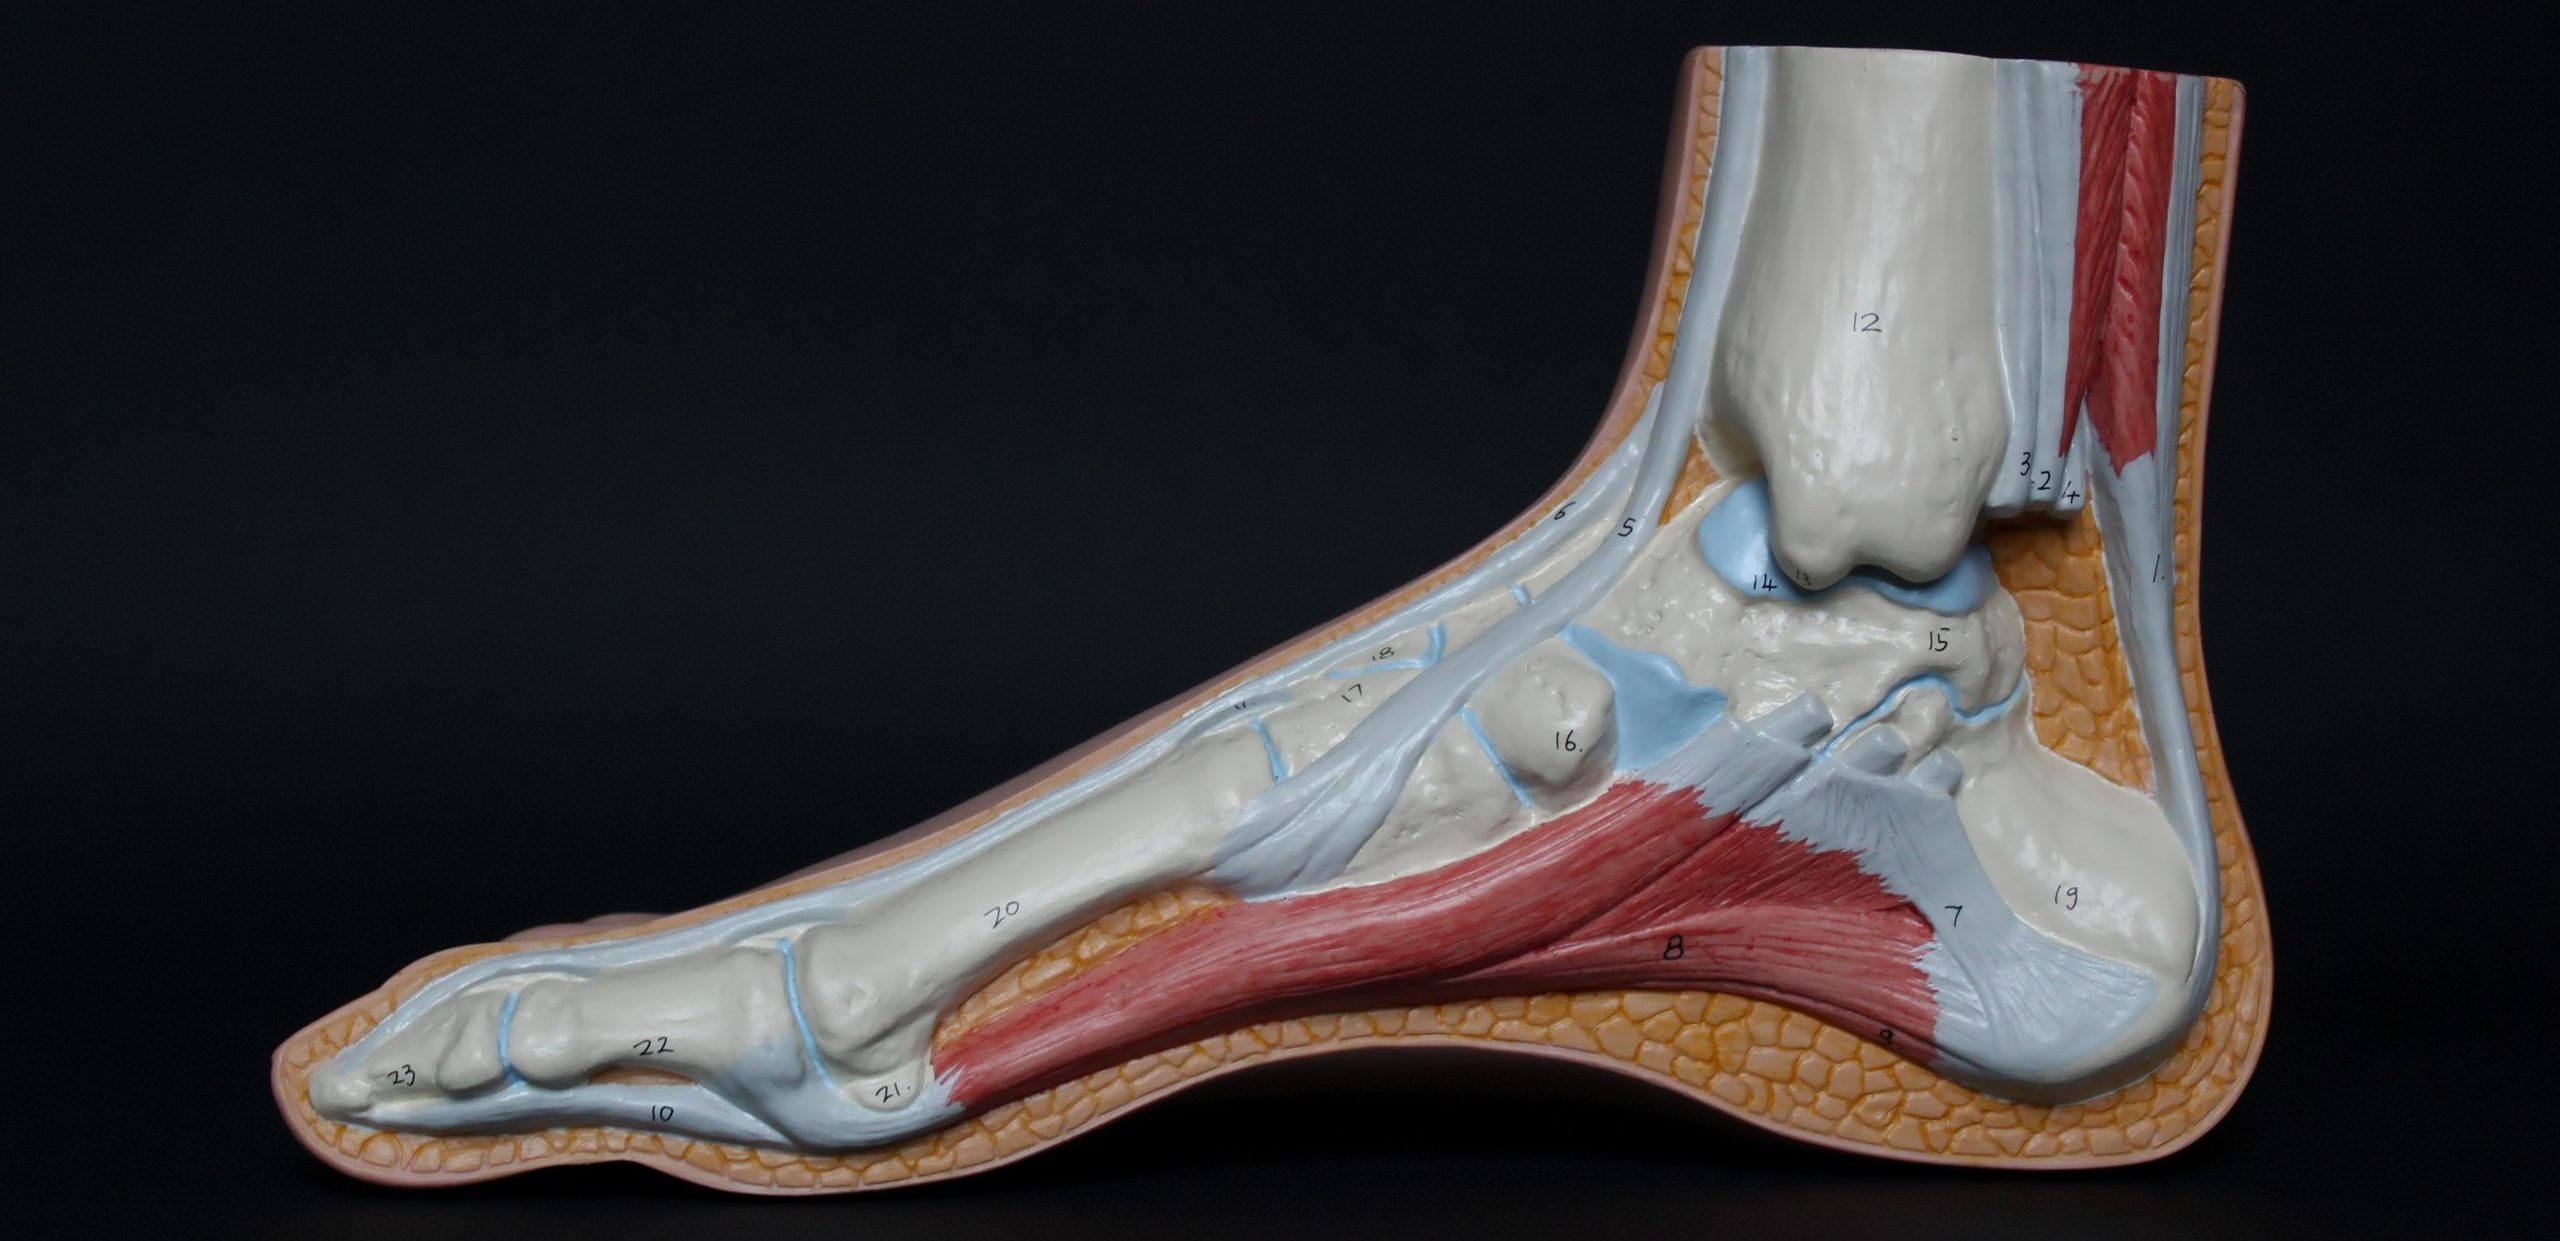 Achillespeesklachten - Rehab - Strive Belgium